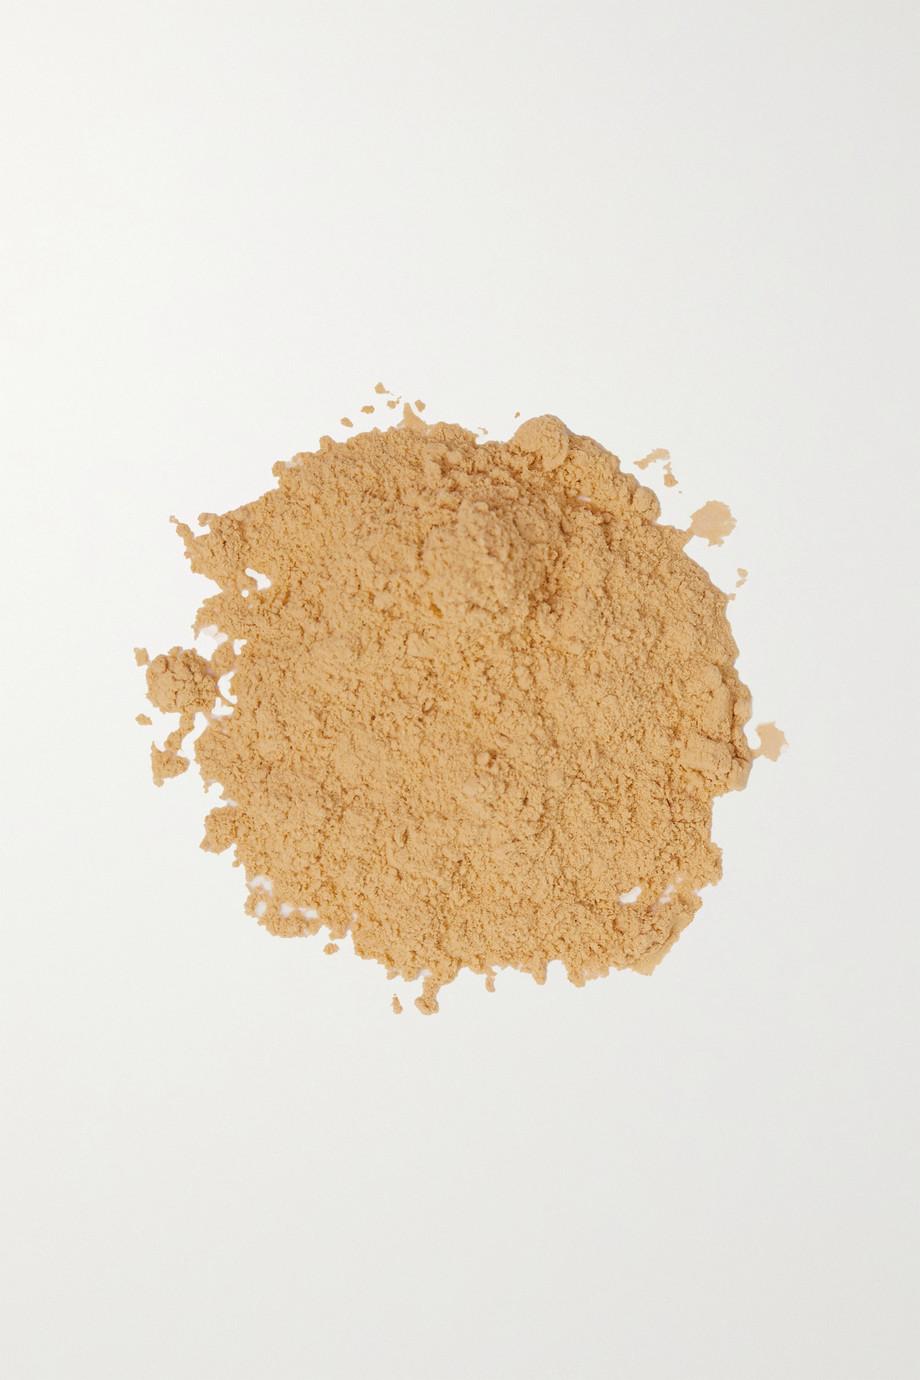 Huda Beauty Baby Bake Loose Setting Powder - Blondie